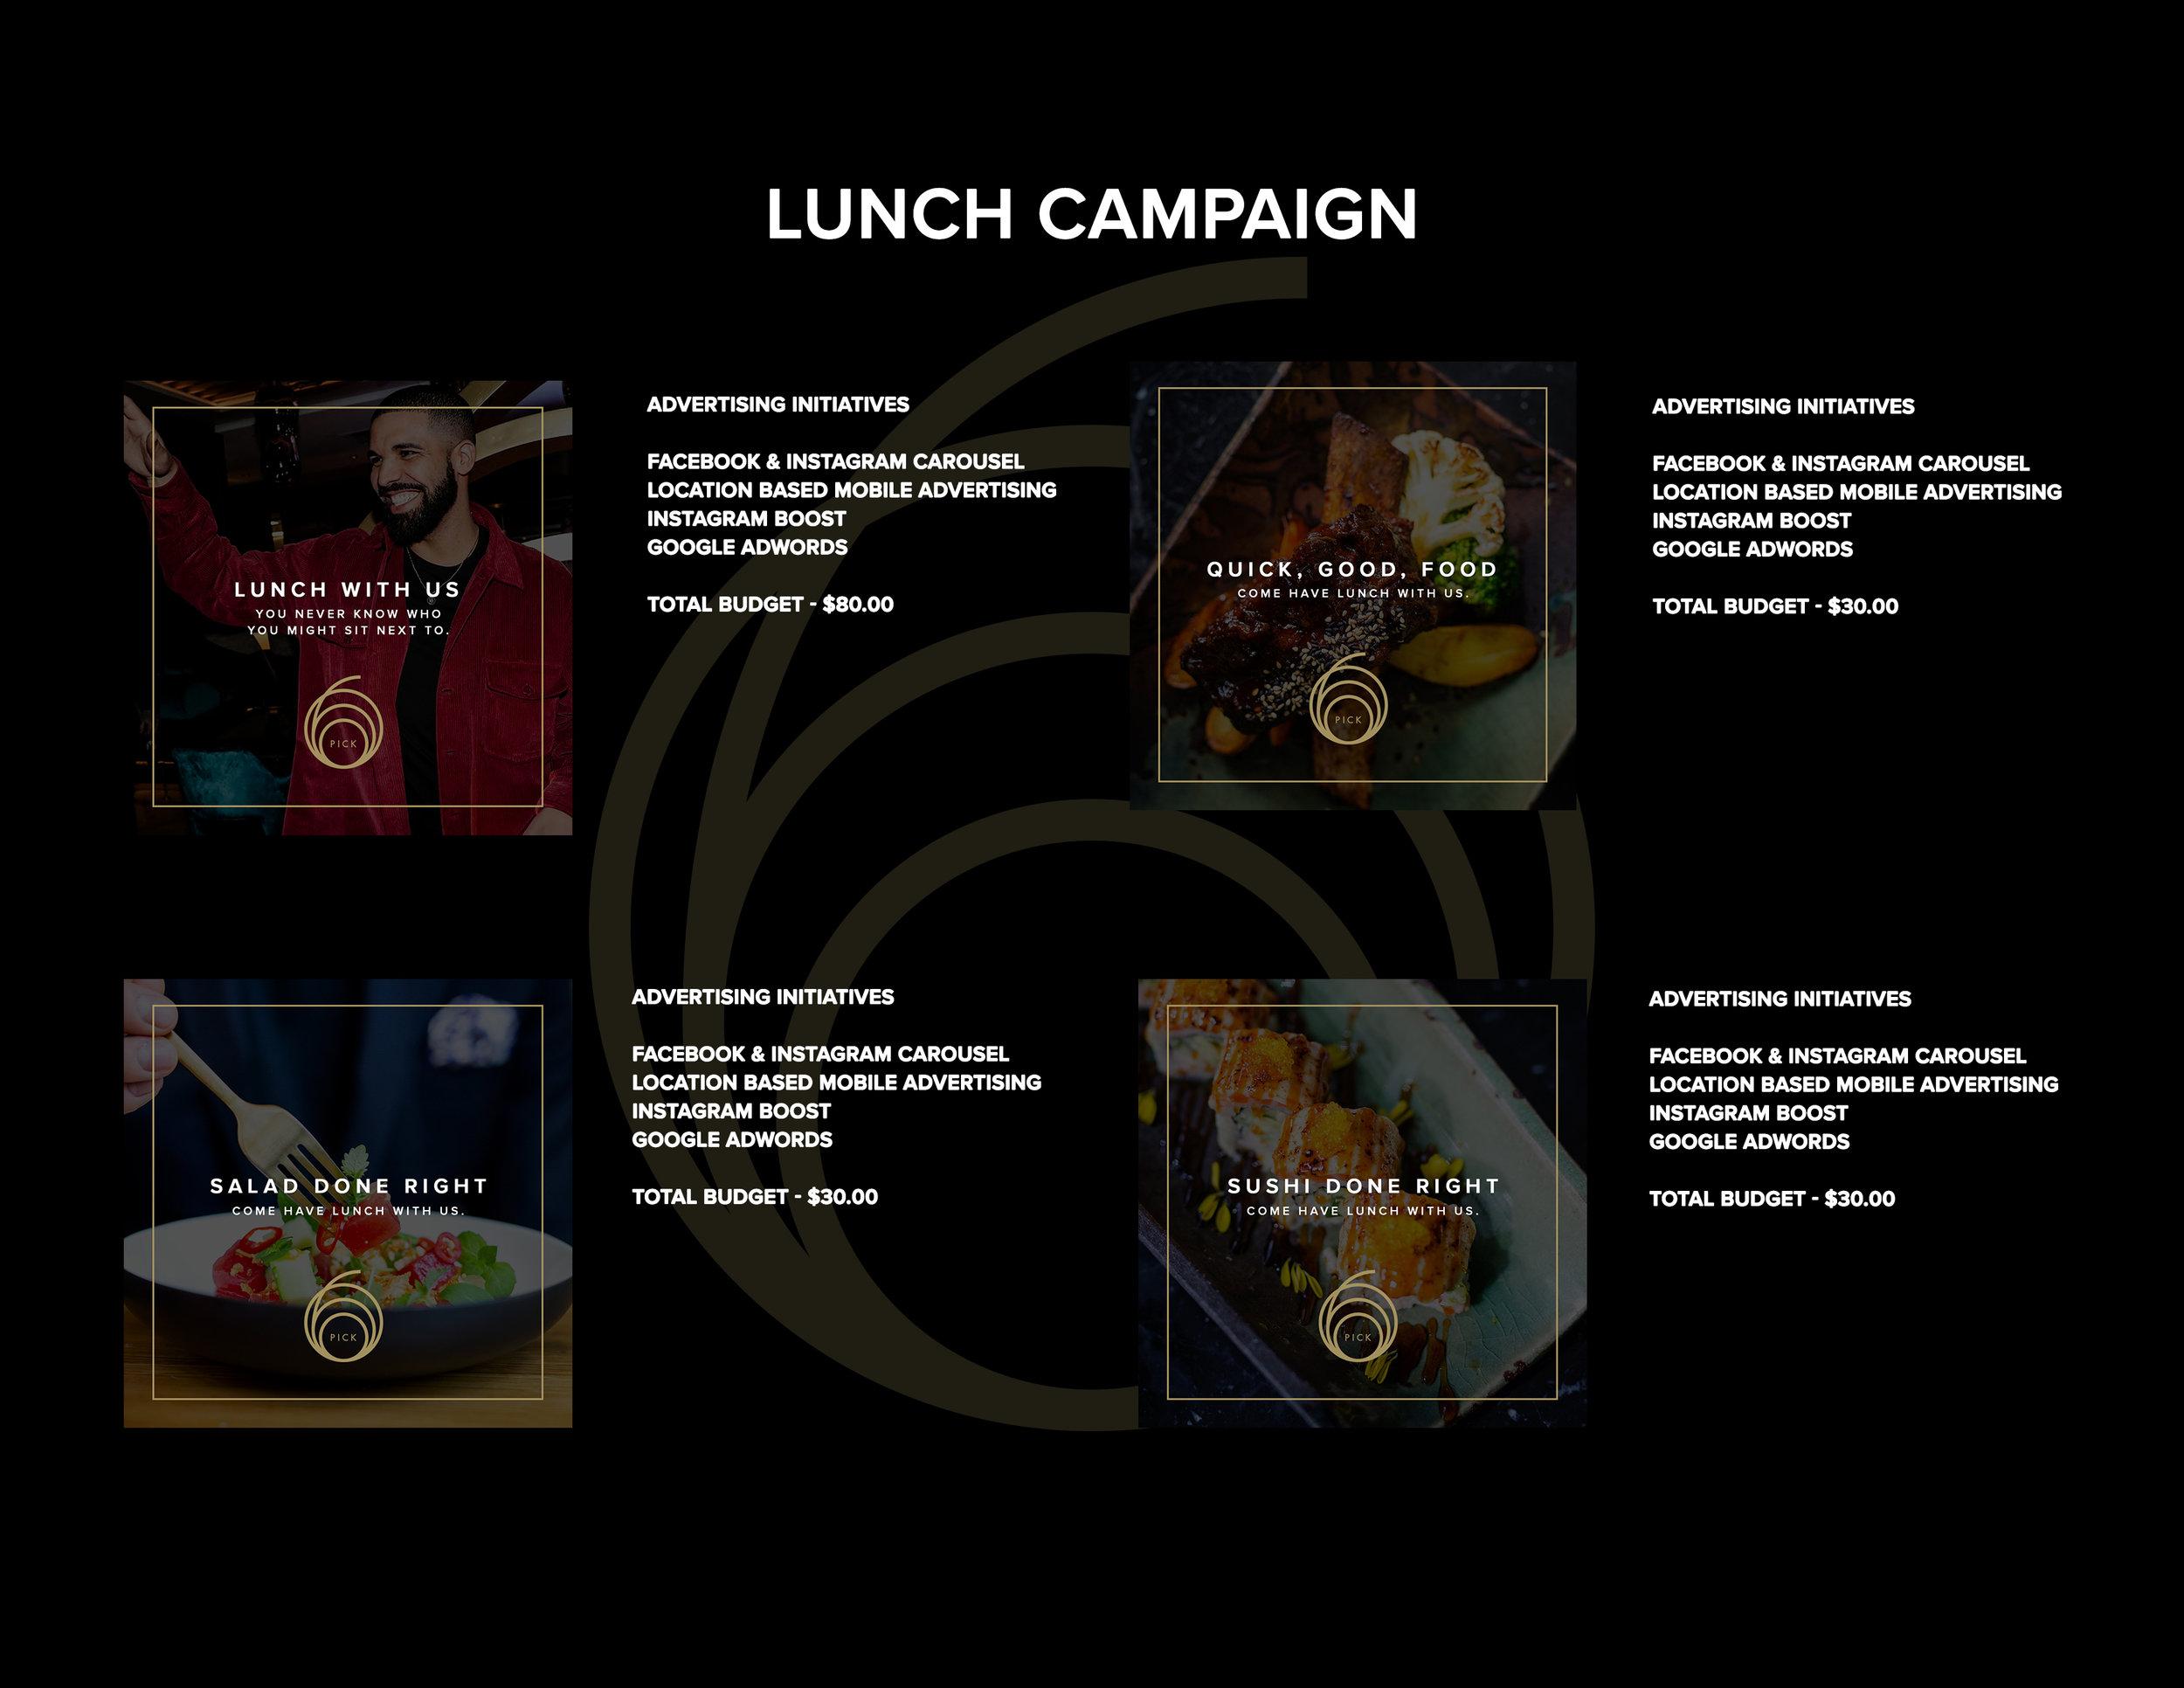 Pick6ix_LunchCampaign.jpg